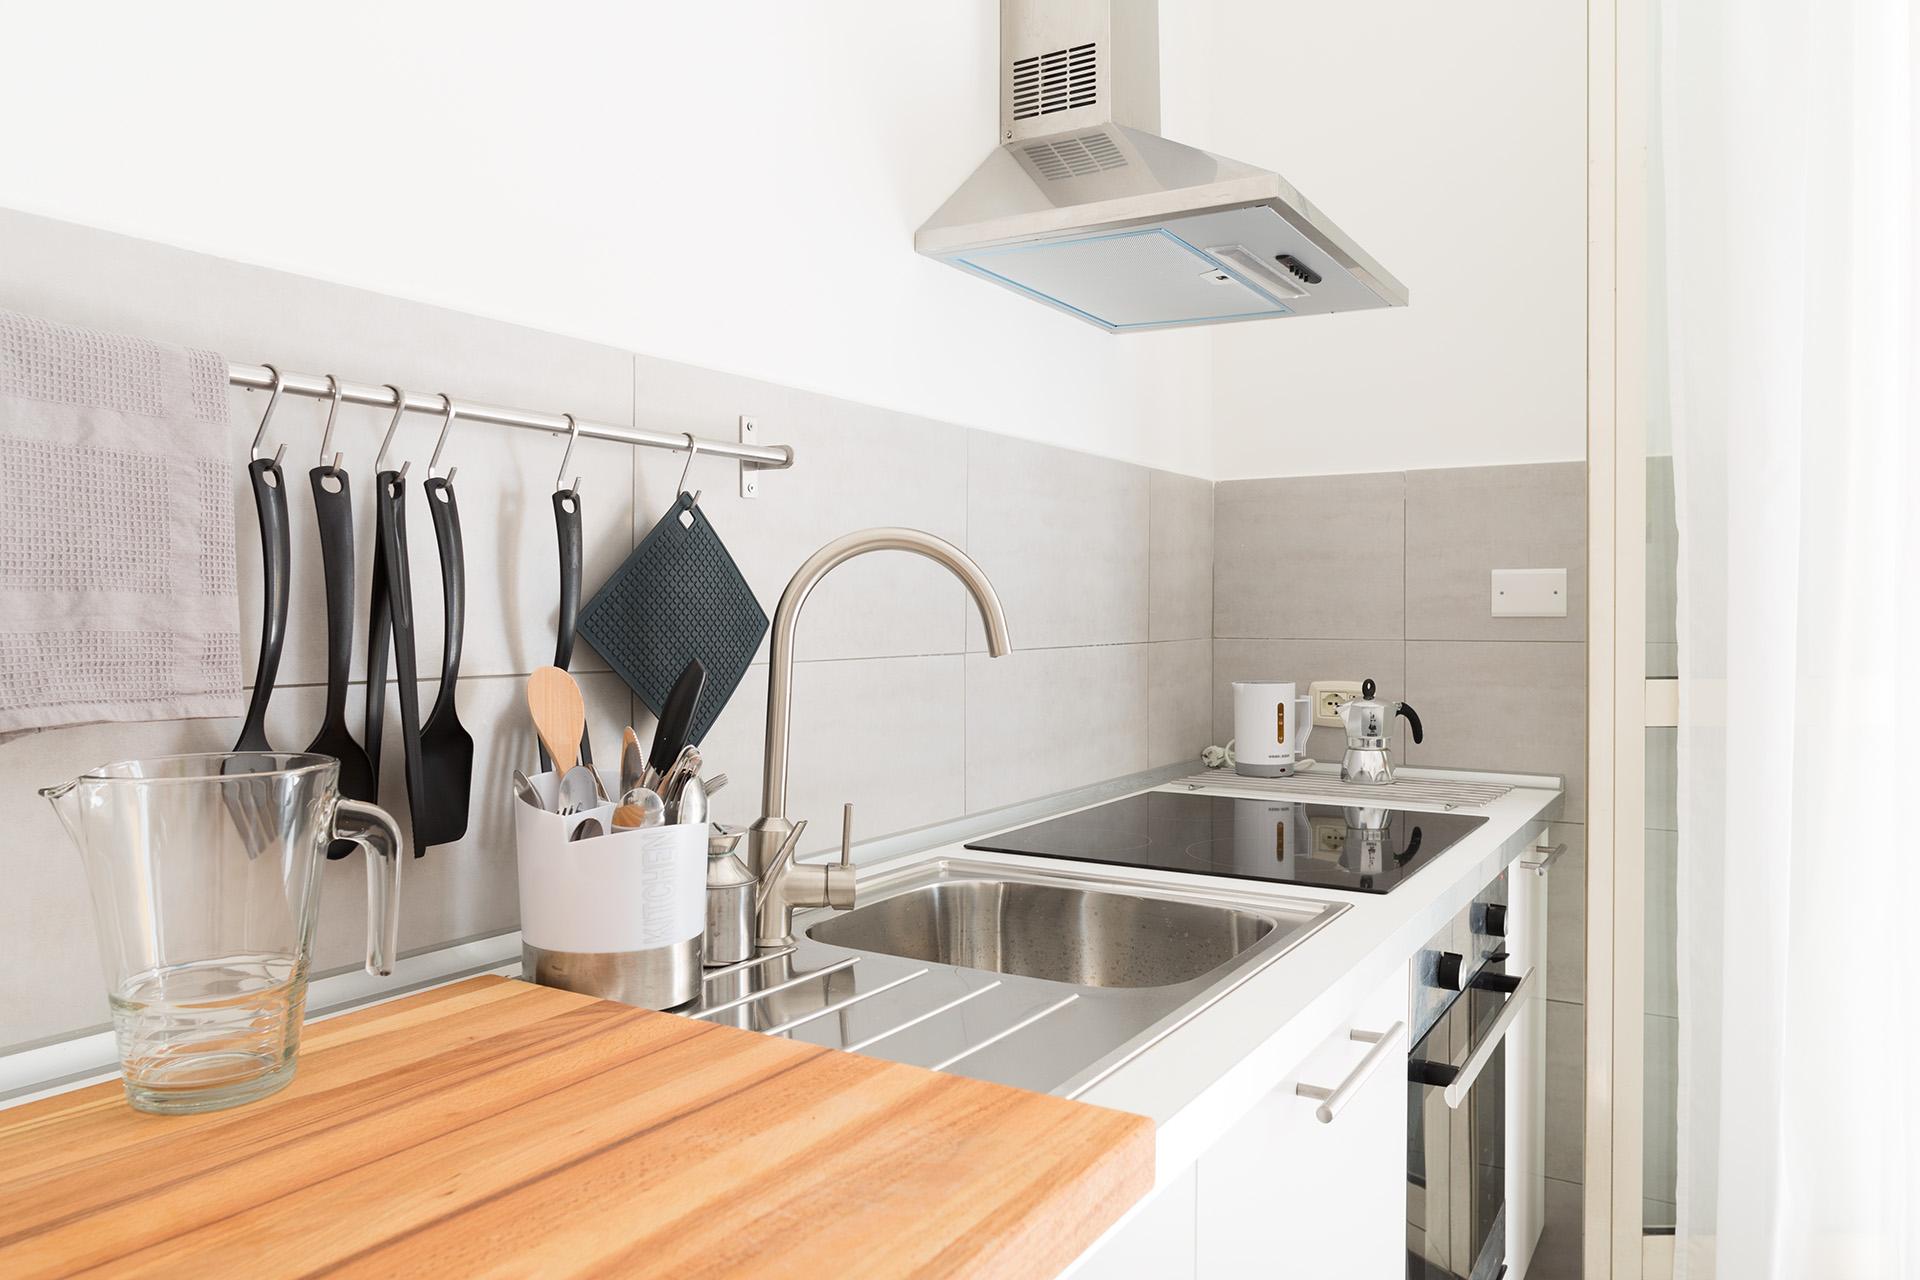 Fotografia d'interni: cucina della casa vacanze Home Inn Rome. copyright © _nf